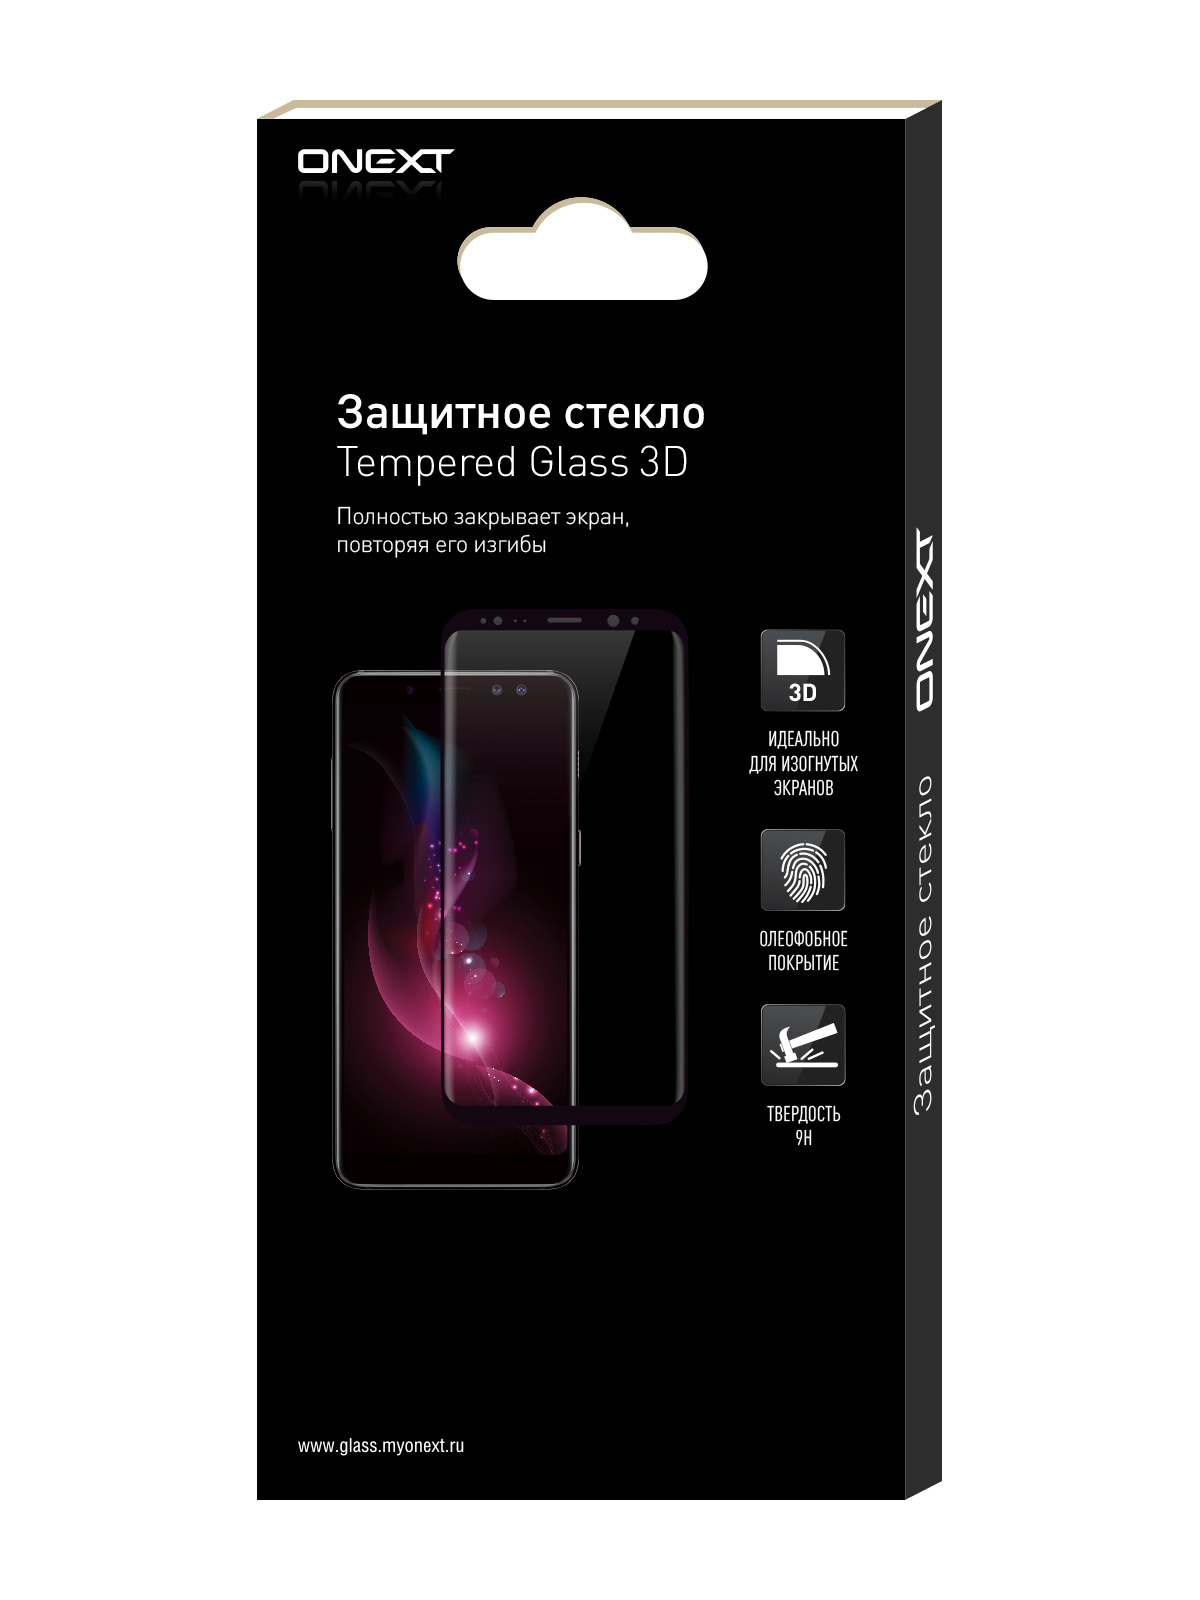 Защитное стекло ONEXT для Samsung Galaxy S6 Edge White